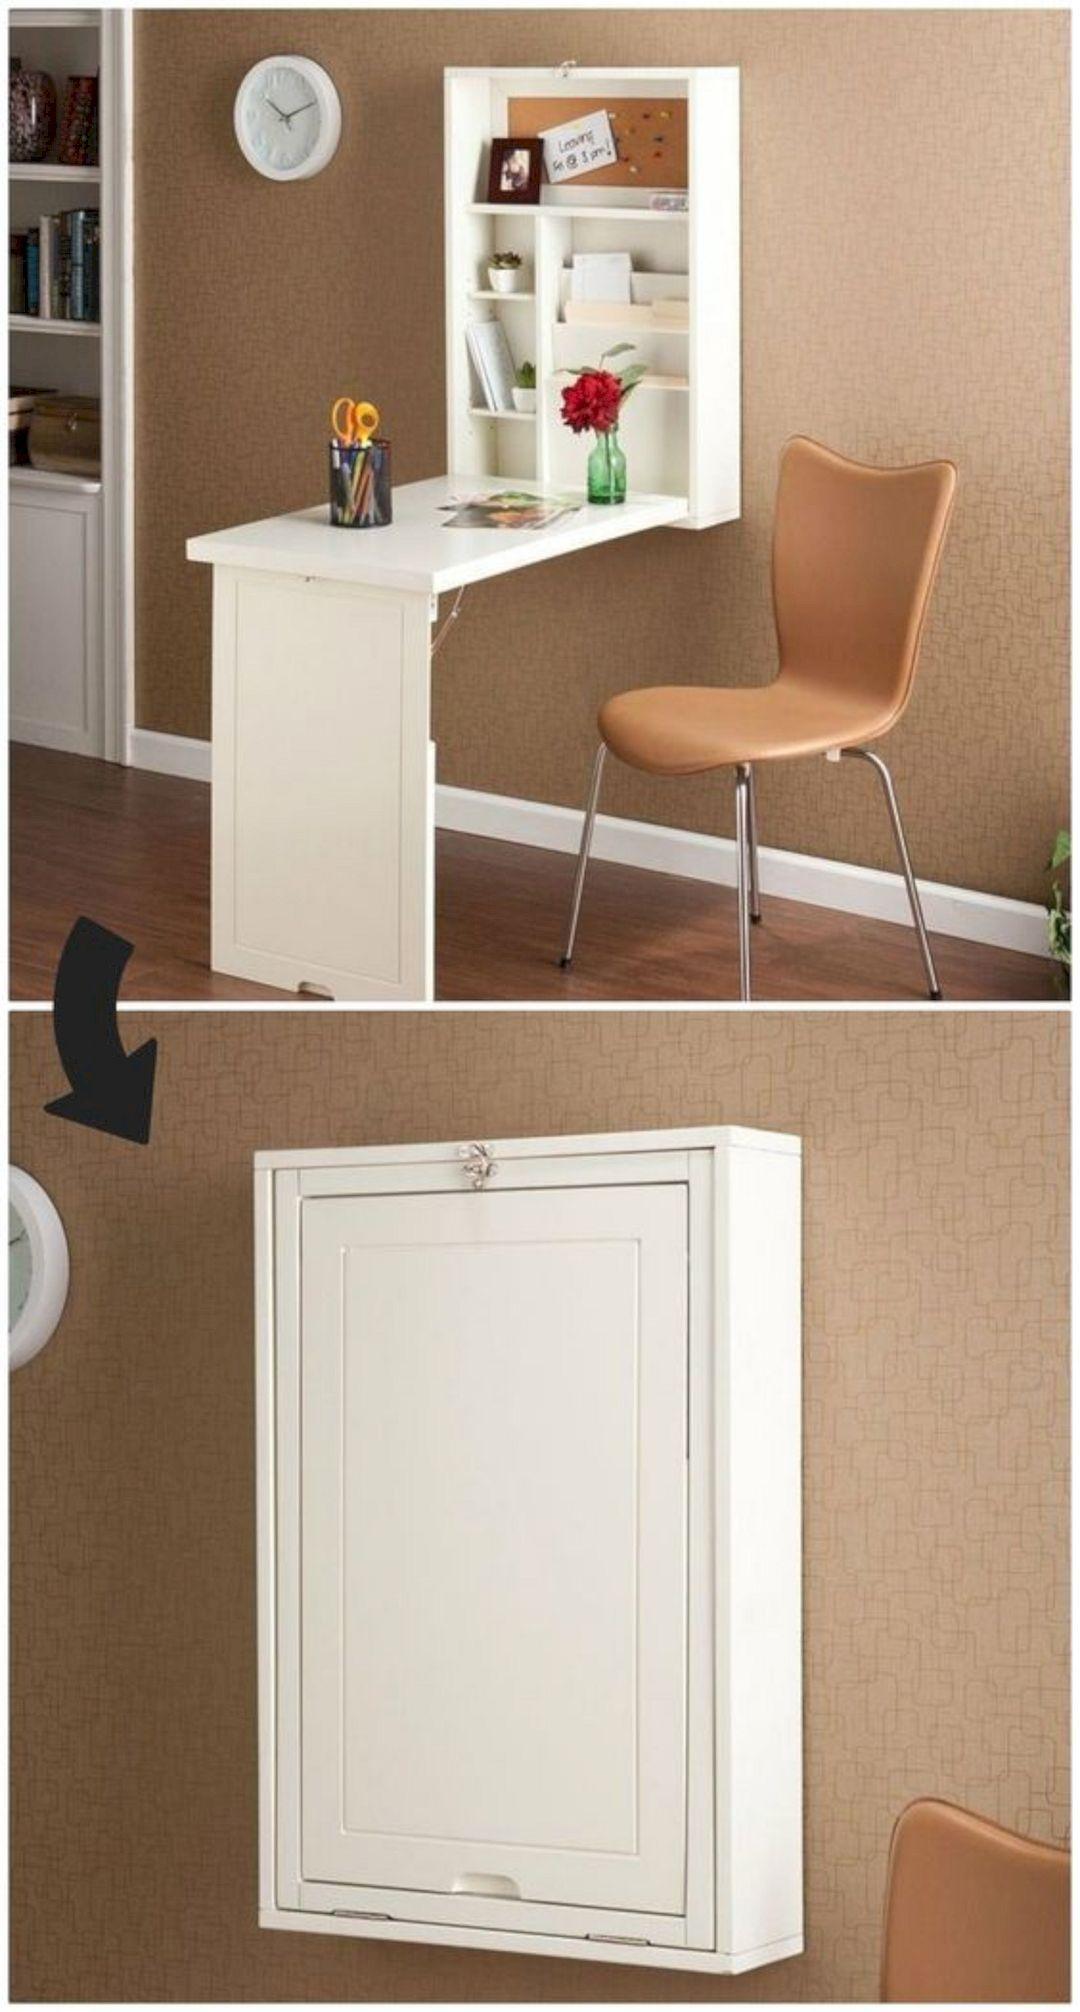 18 diy space saving furniture ideas https www futuristarchitecture com